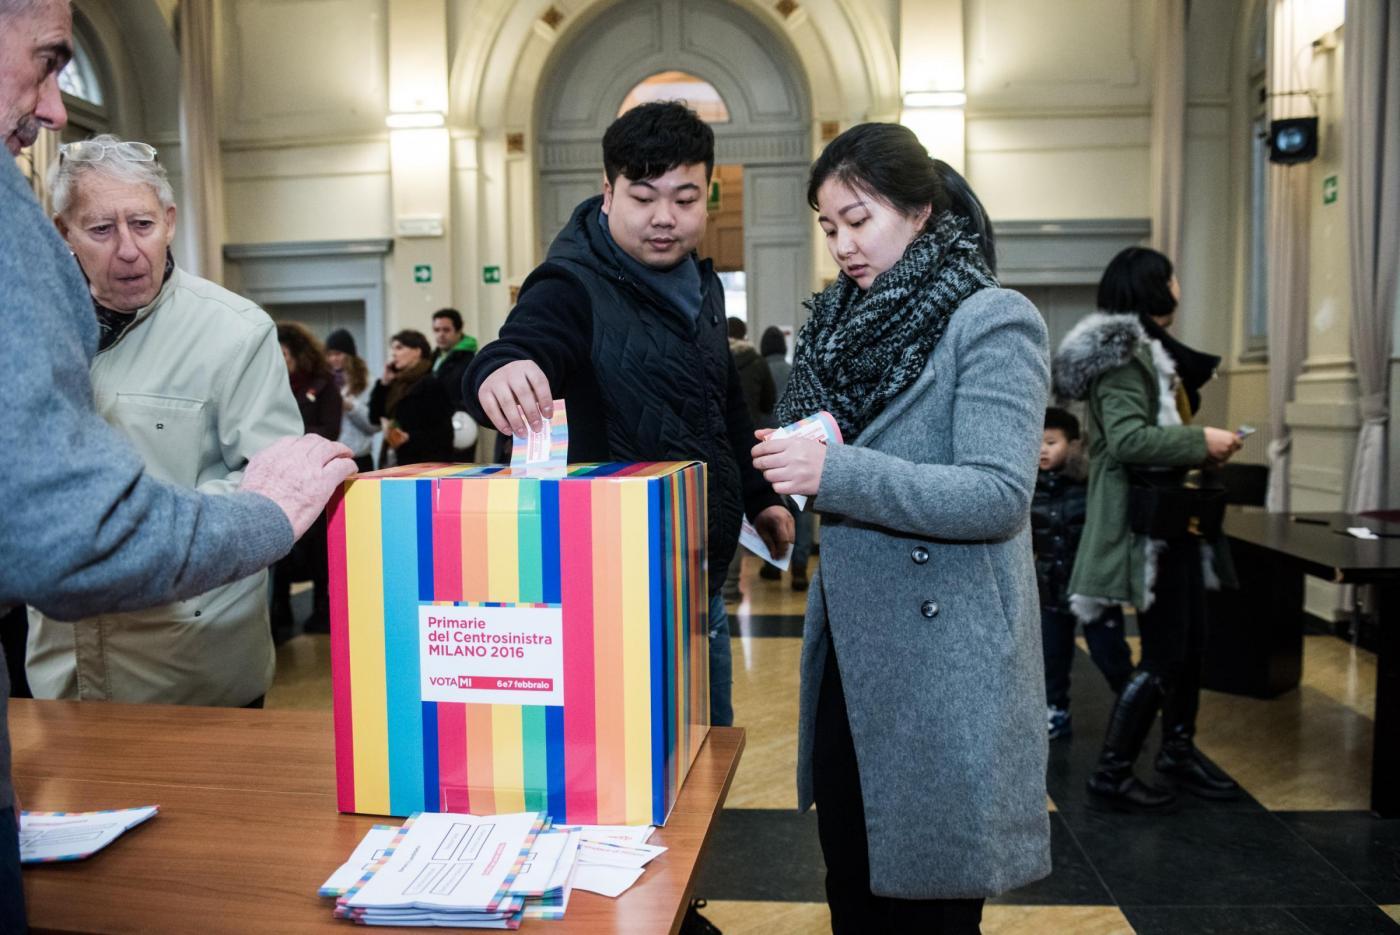 Cinesi votano alle primarie del centrosinistra